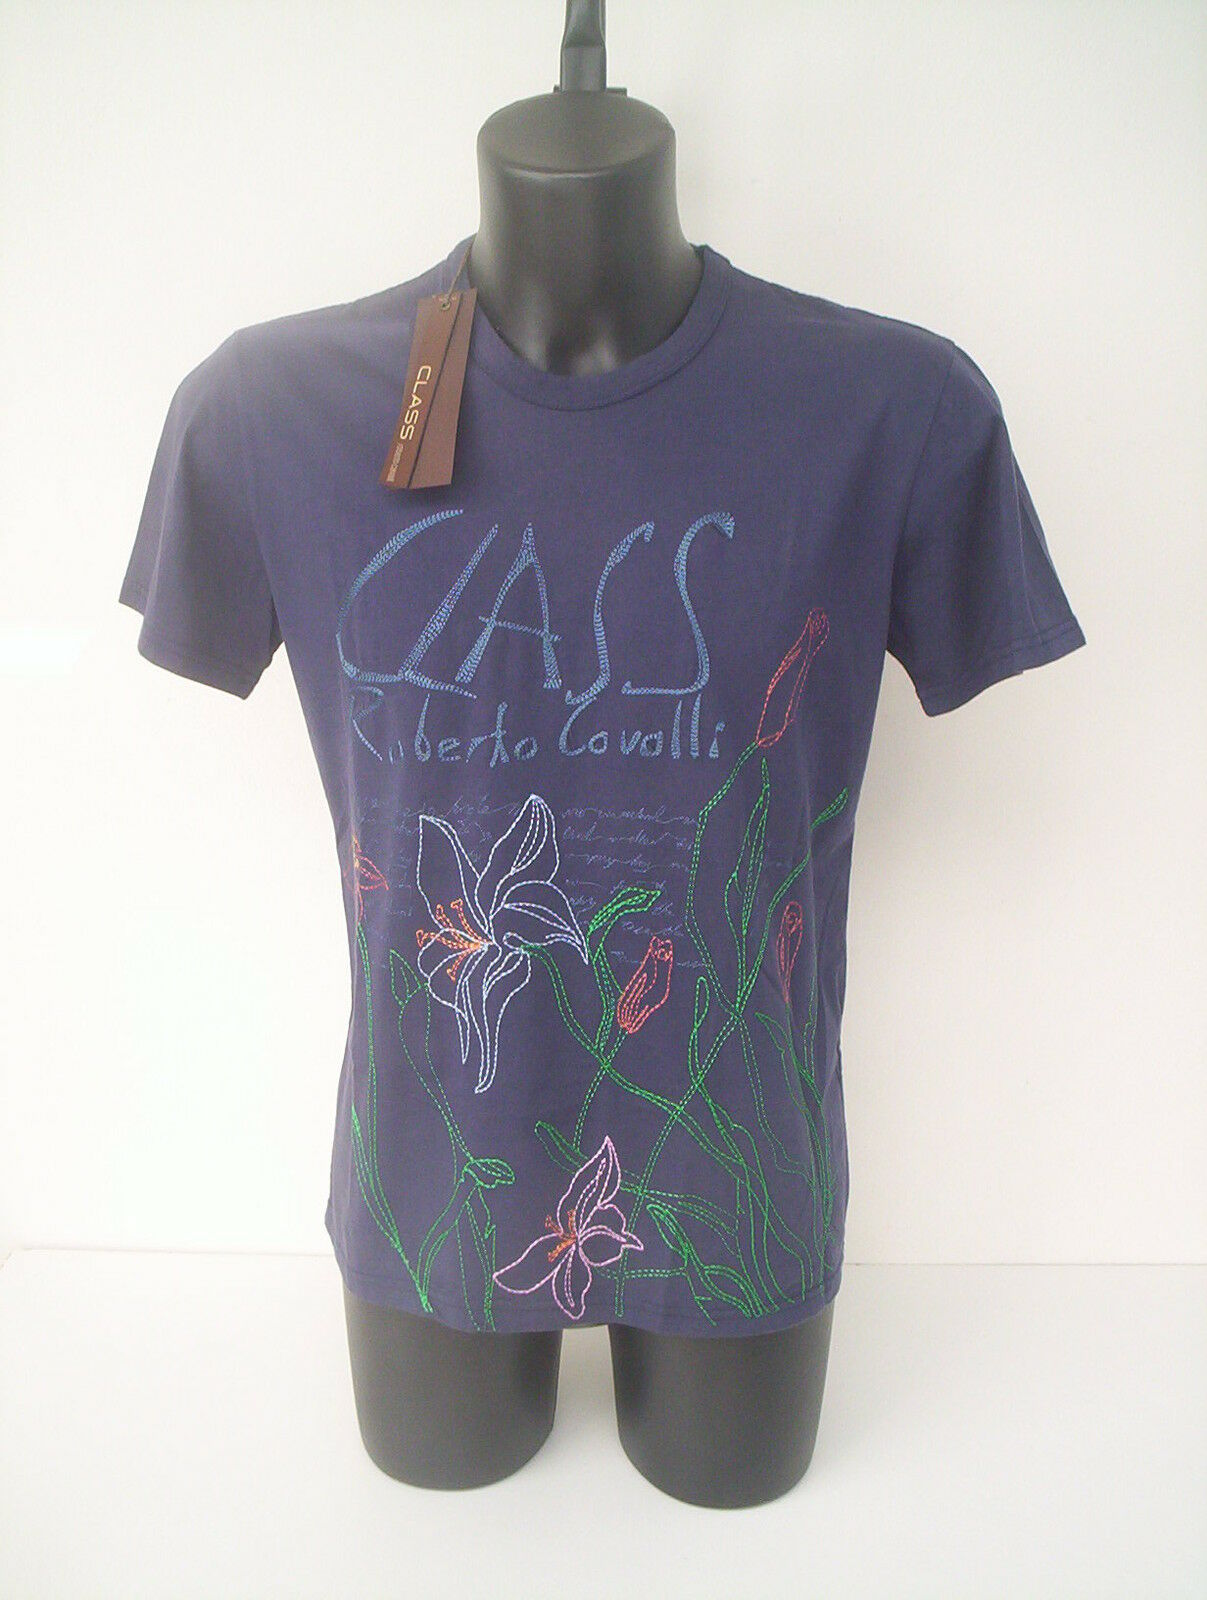 Roberto Cavalli  t-shirt  blu  marine ricamata  tg  48